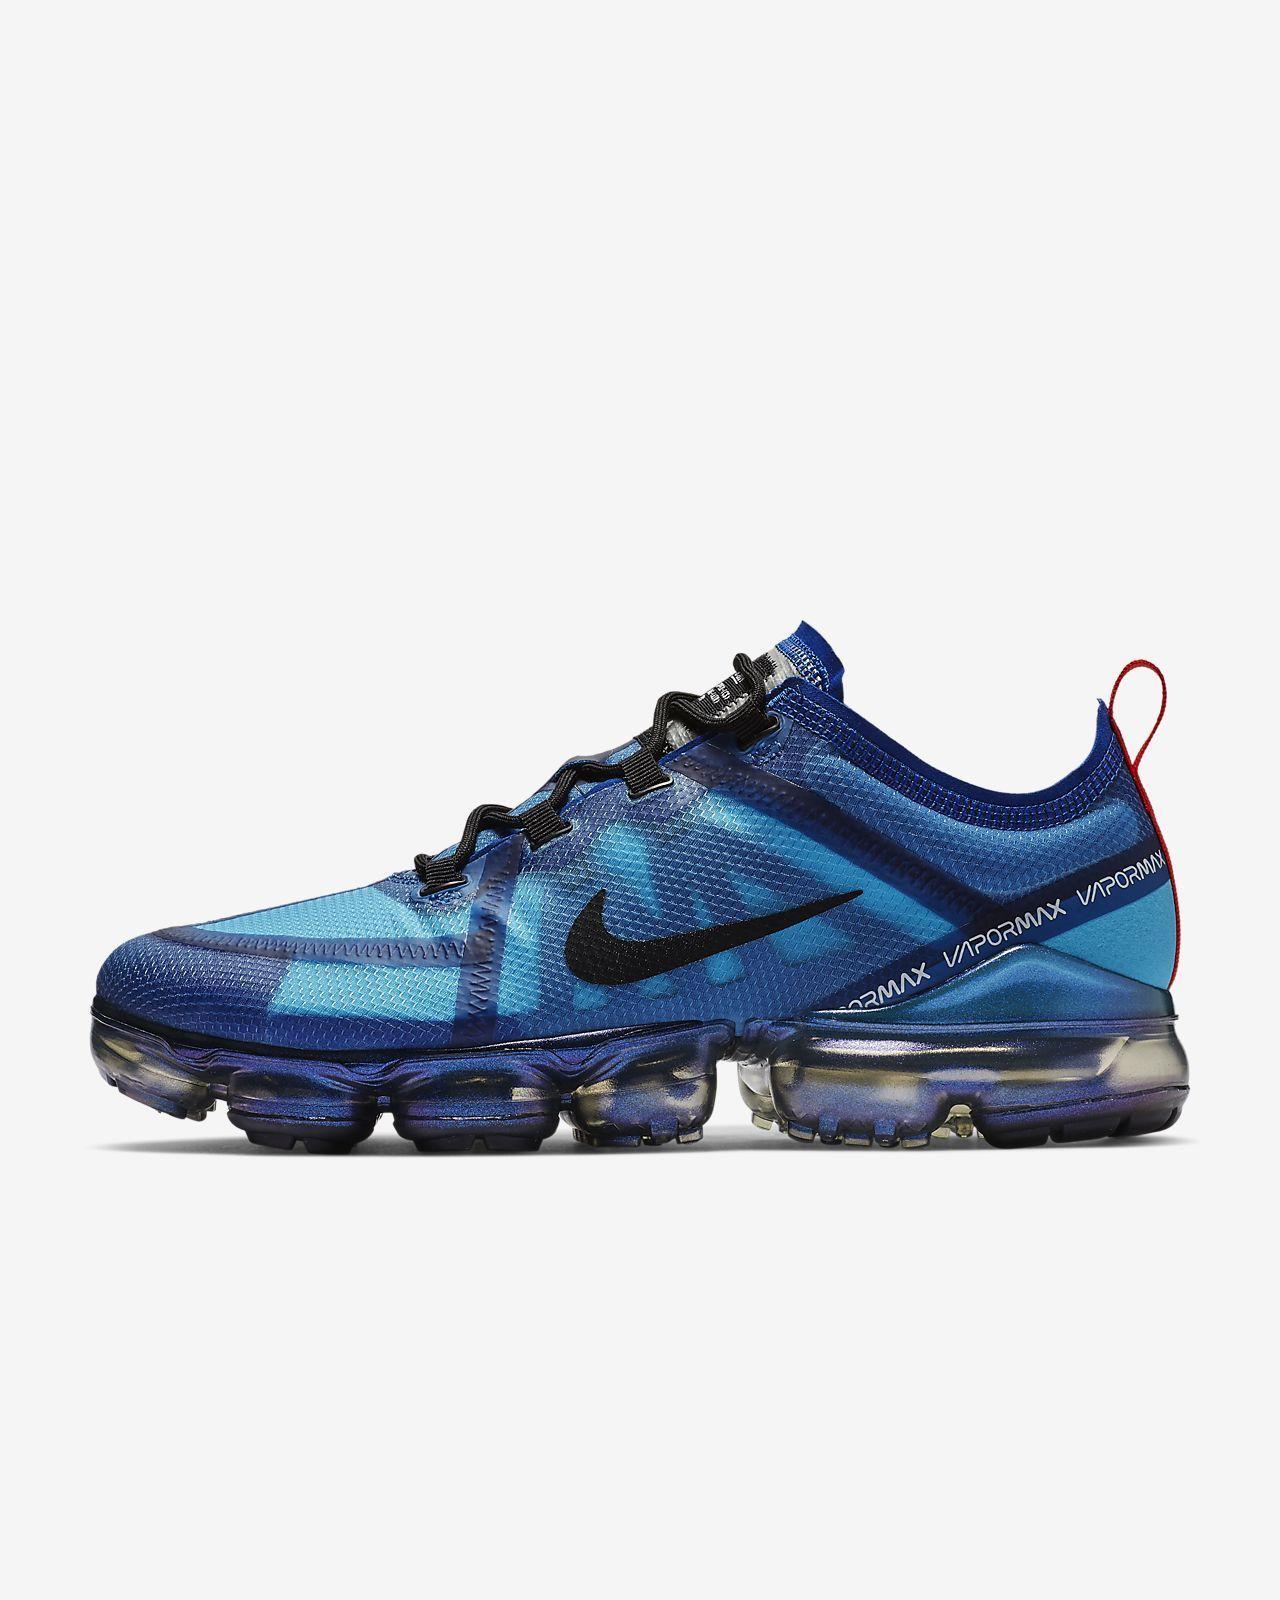 promo code 4a9d9 7e21c Nike Air VaporMax 2019 Shoe. Nike.com